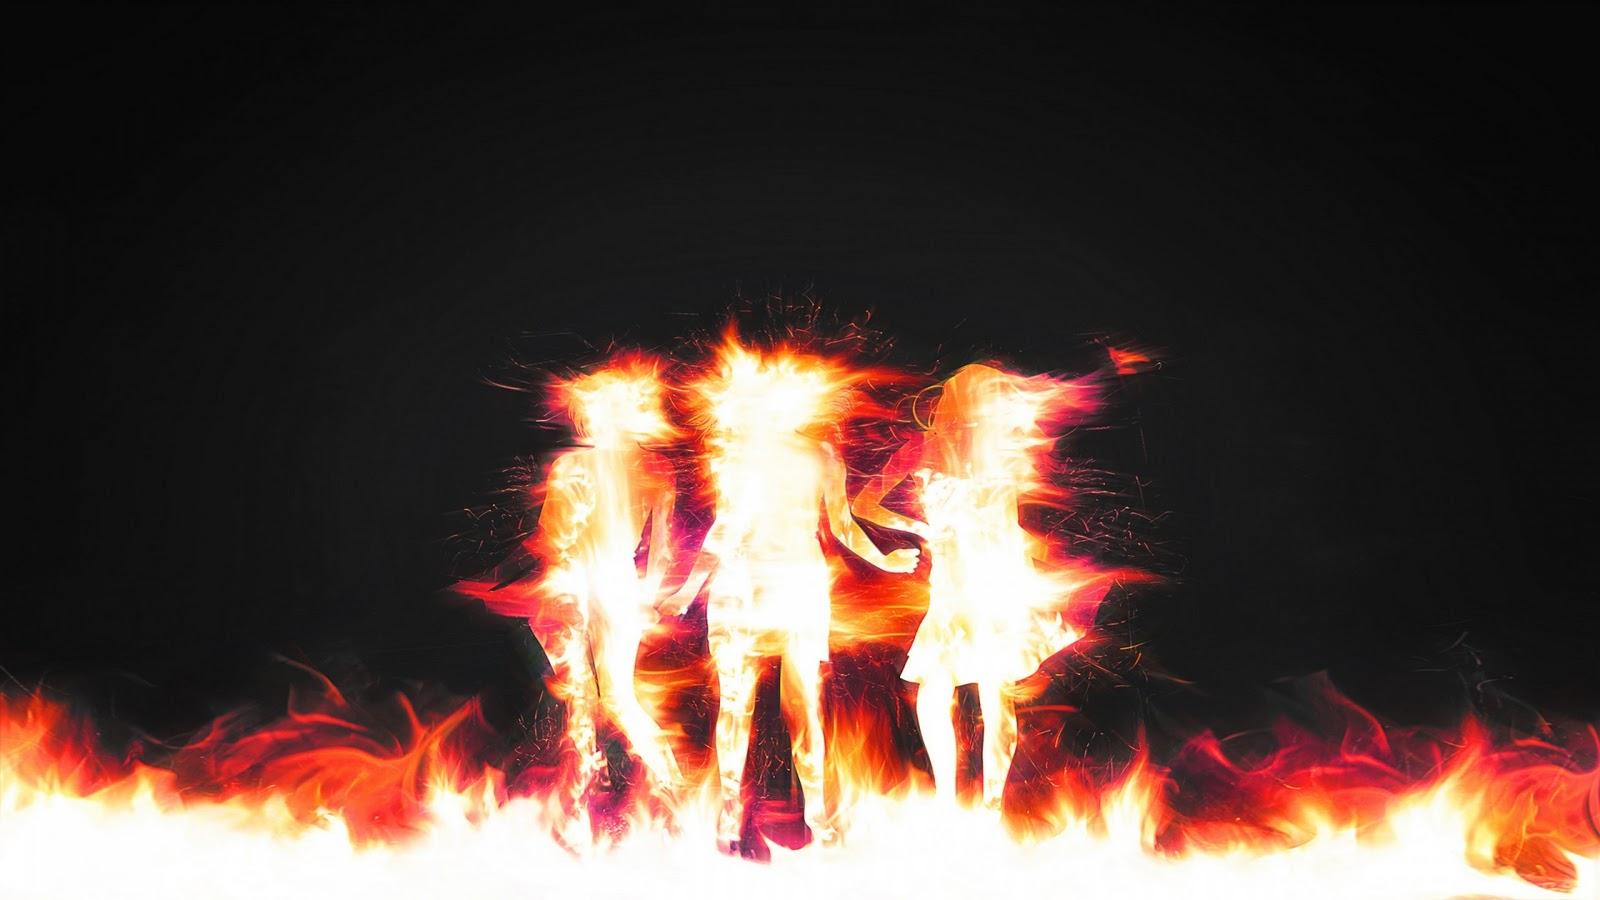 http://1.bp.blogspot.com/-C1_LG1UNEHE/TdjY3si2udI/AAAAAAAAANM/rUryHD5lIWU/s1600/fire-girls-wallpaper_1920x1080-HD.jpg